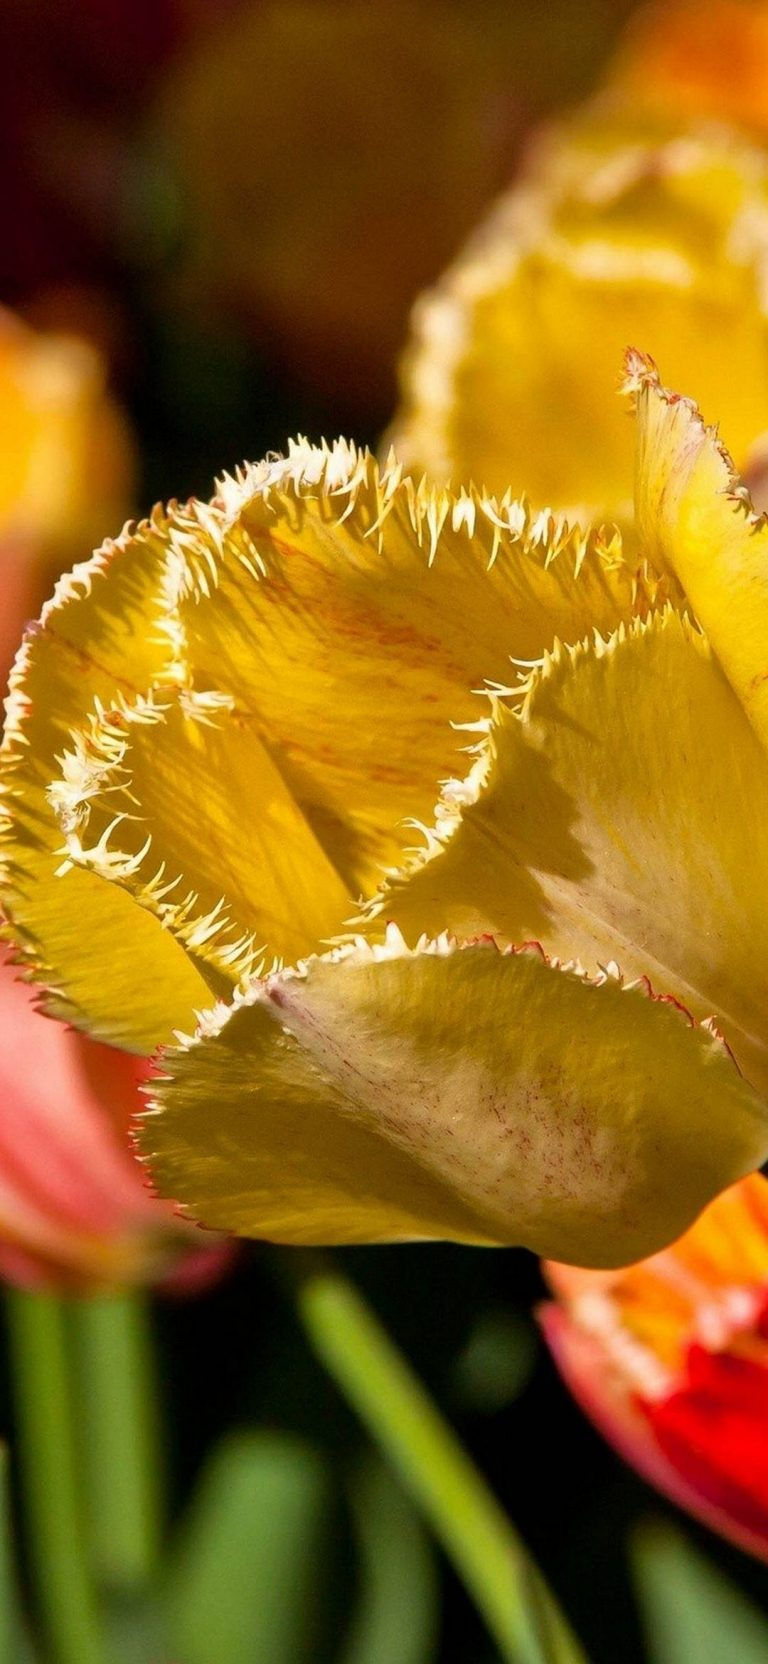 Tulip Petals Branch 1080x2340 768x1664